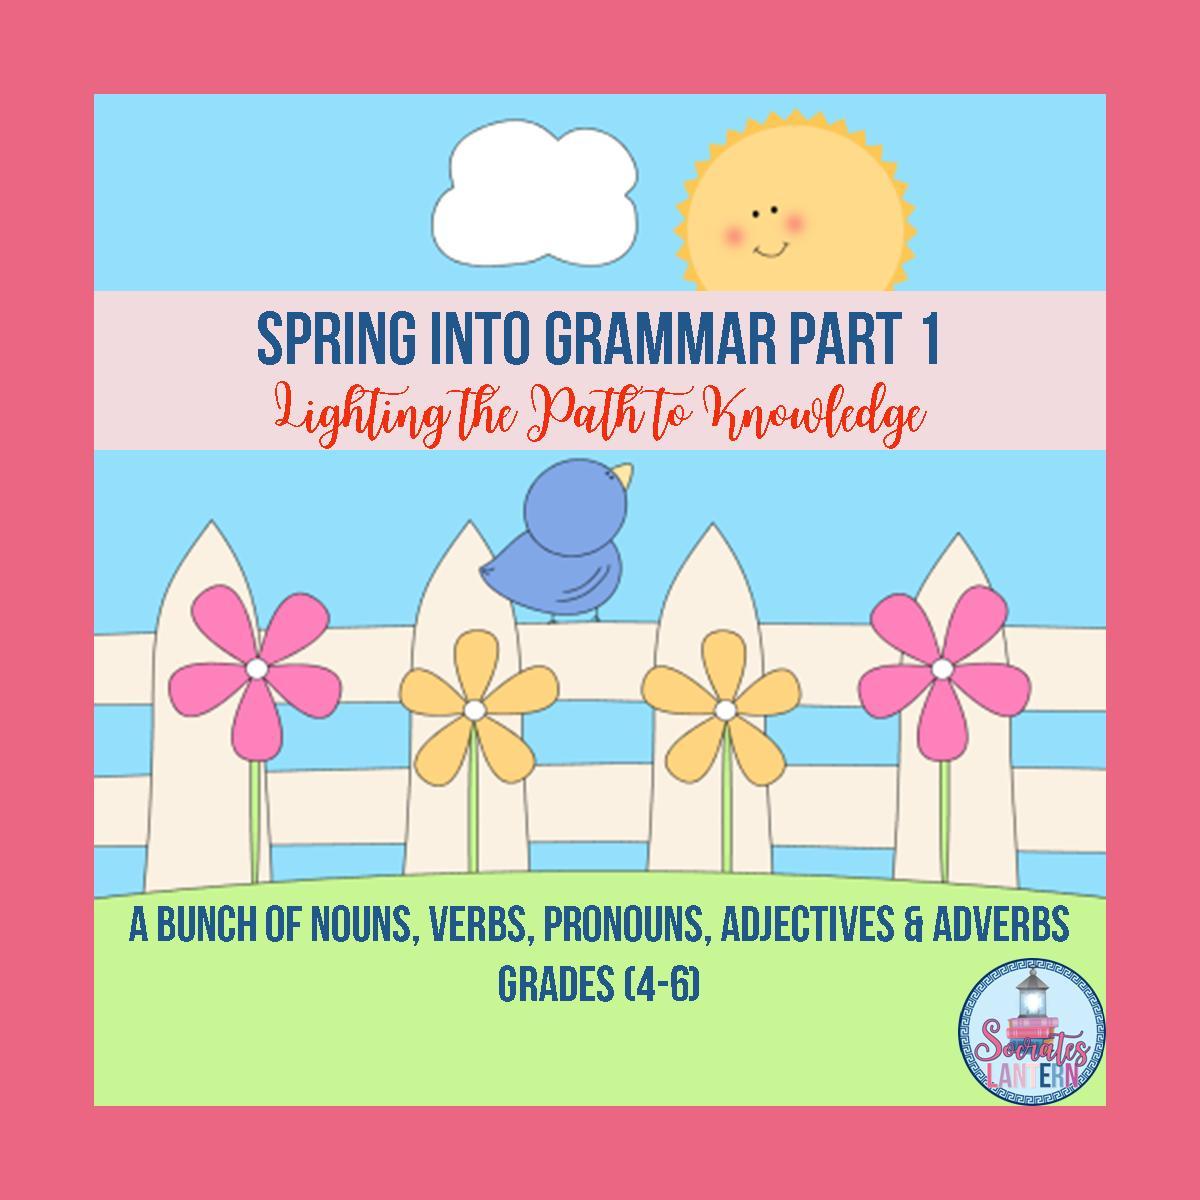 Spring into Grammar Part 1